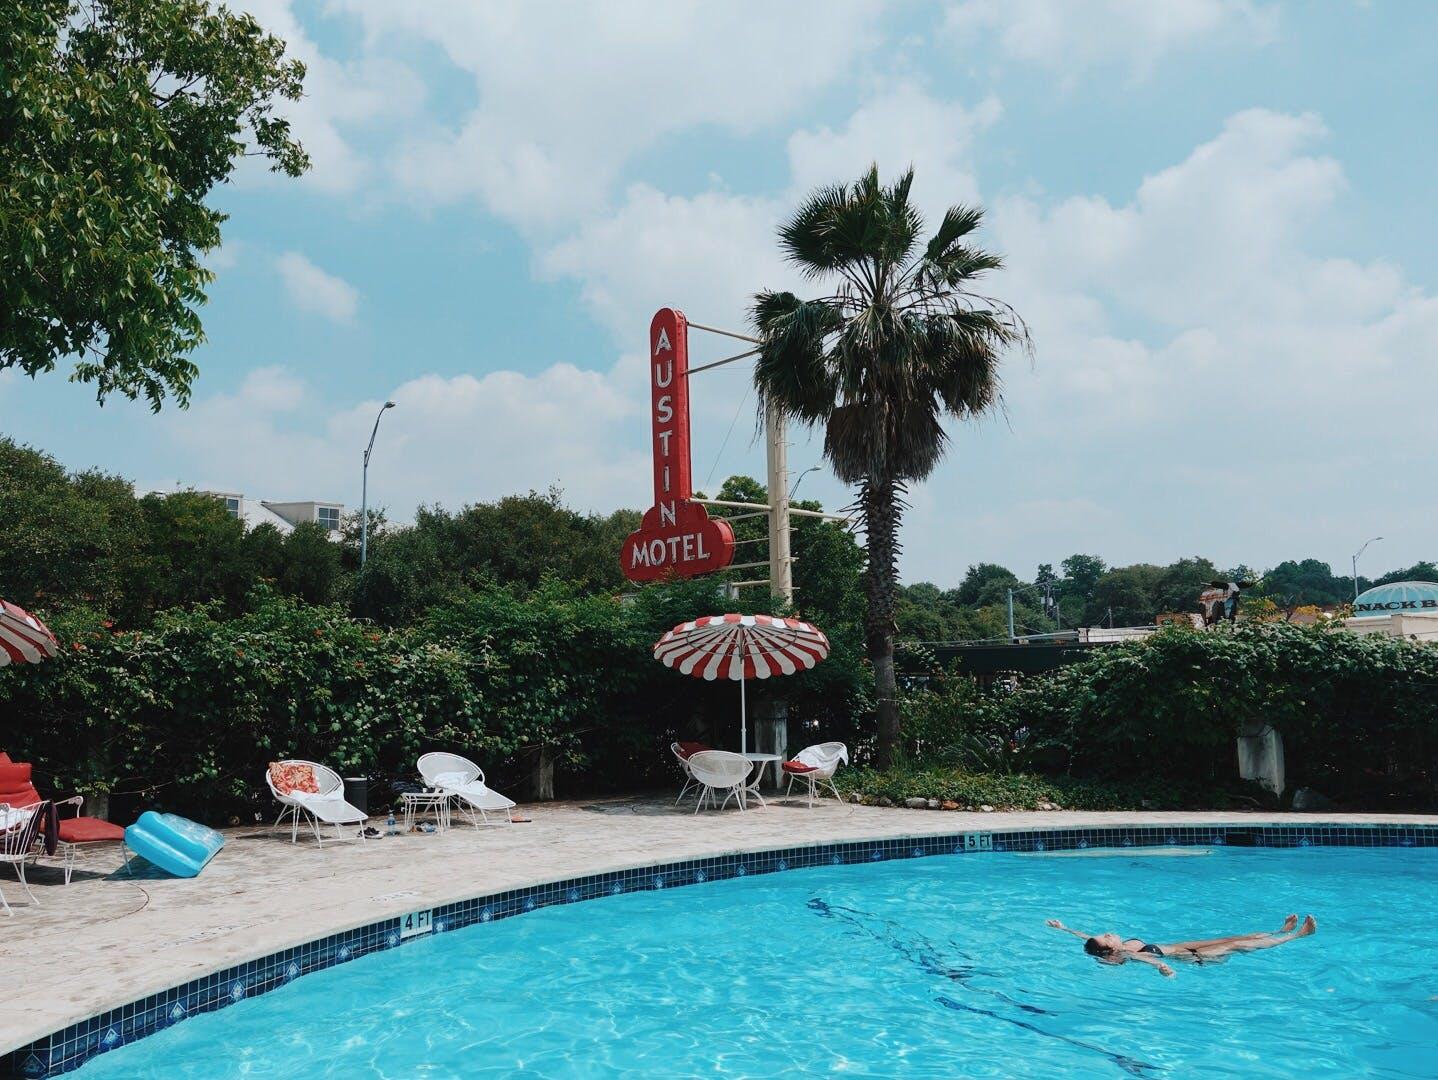 austin motel texas dallas new hotels 2017